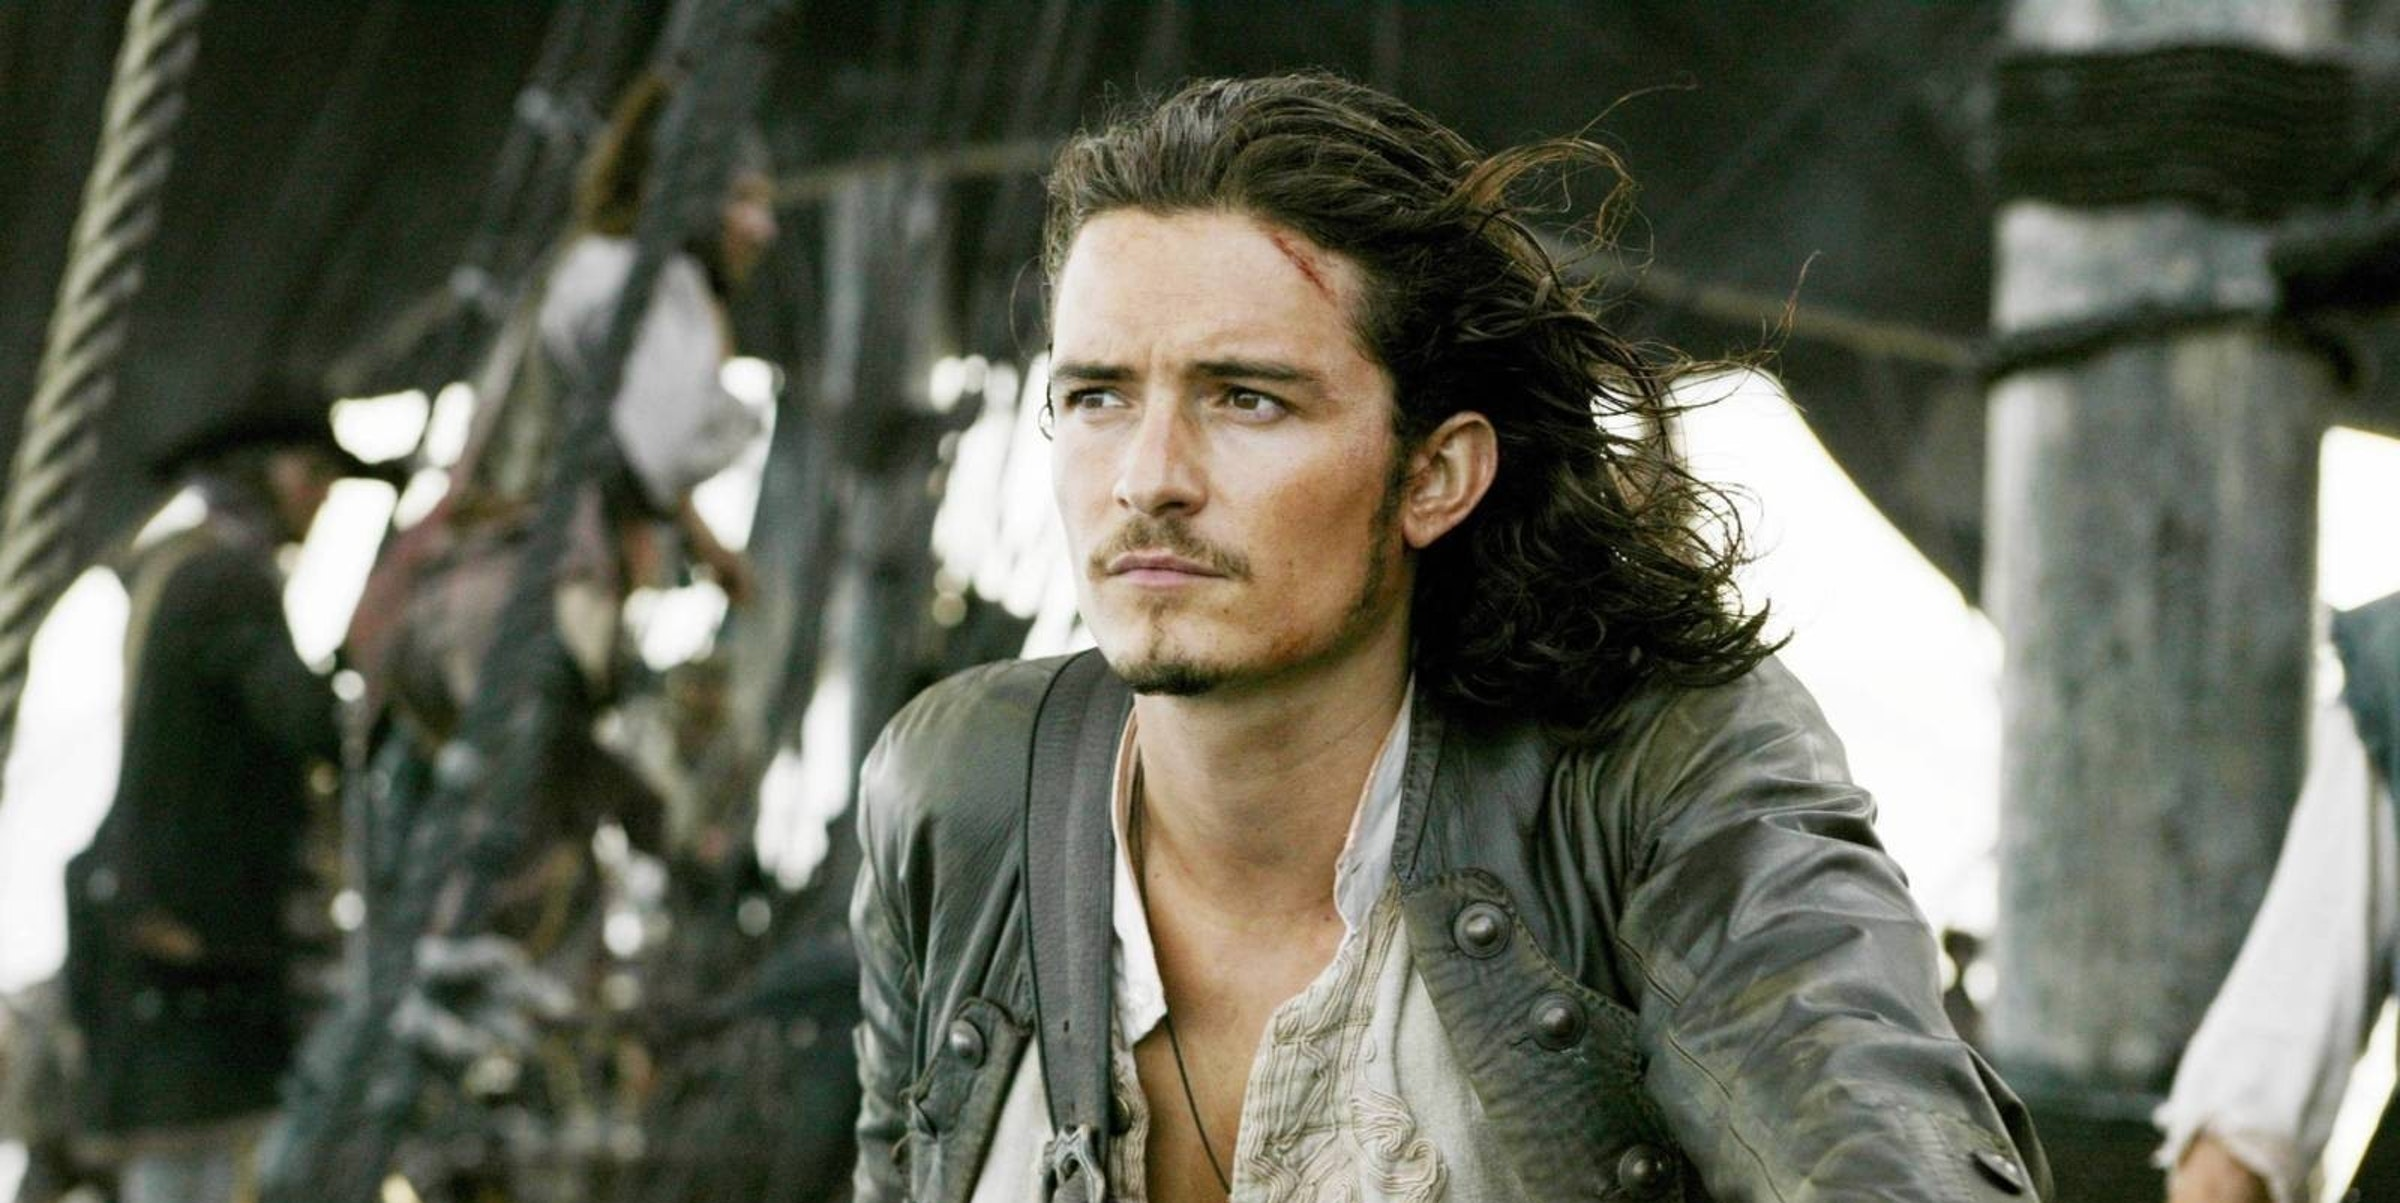 Pirates of the Caribbean: Dead Men Tell No Tales Will Turner Returns Orlando Bloom Super Bowl Trailer